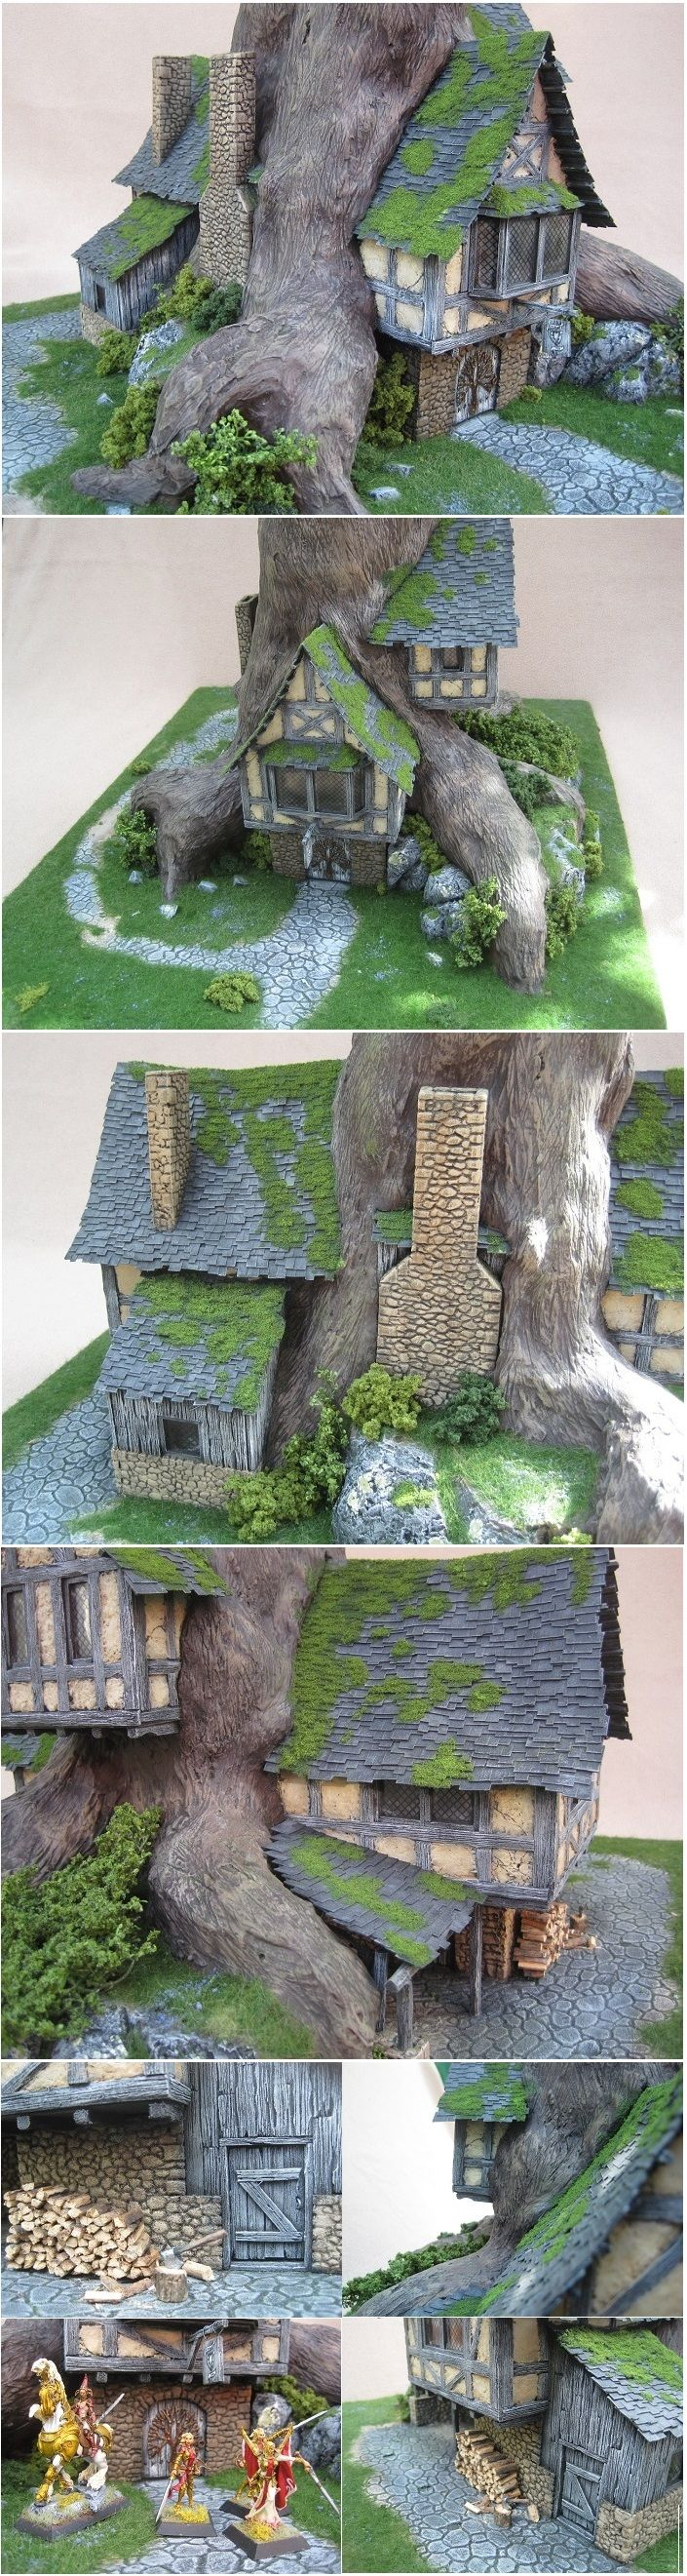 Gnome In Garden: 15 Excellent DIY Backyard Decoration & Outside